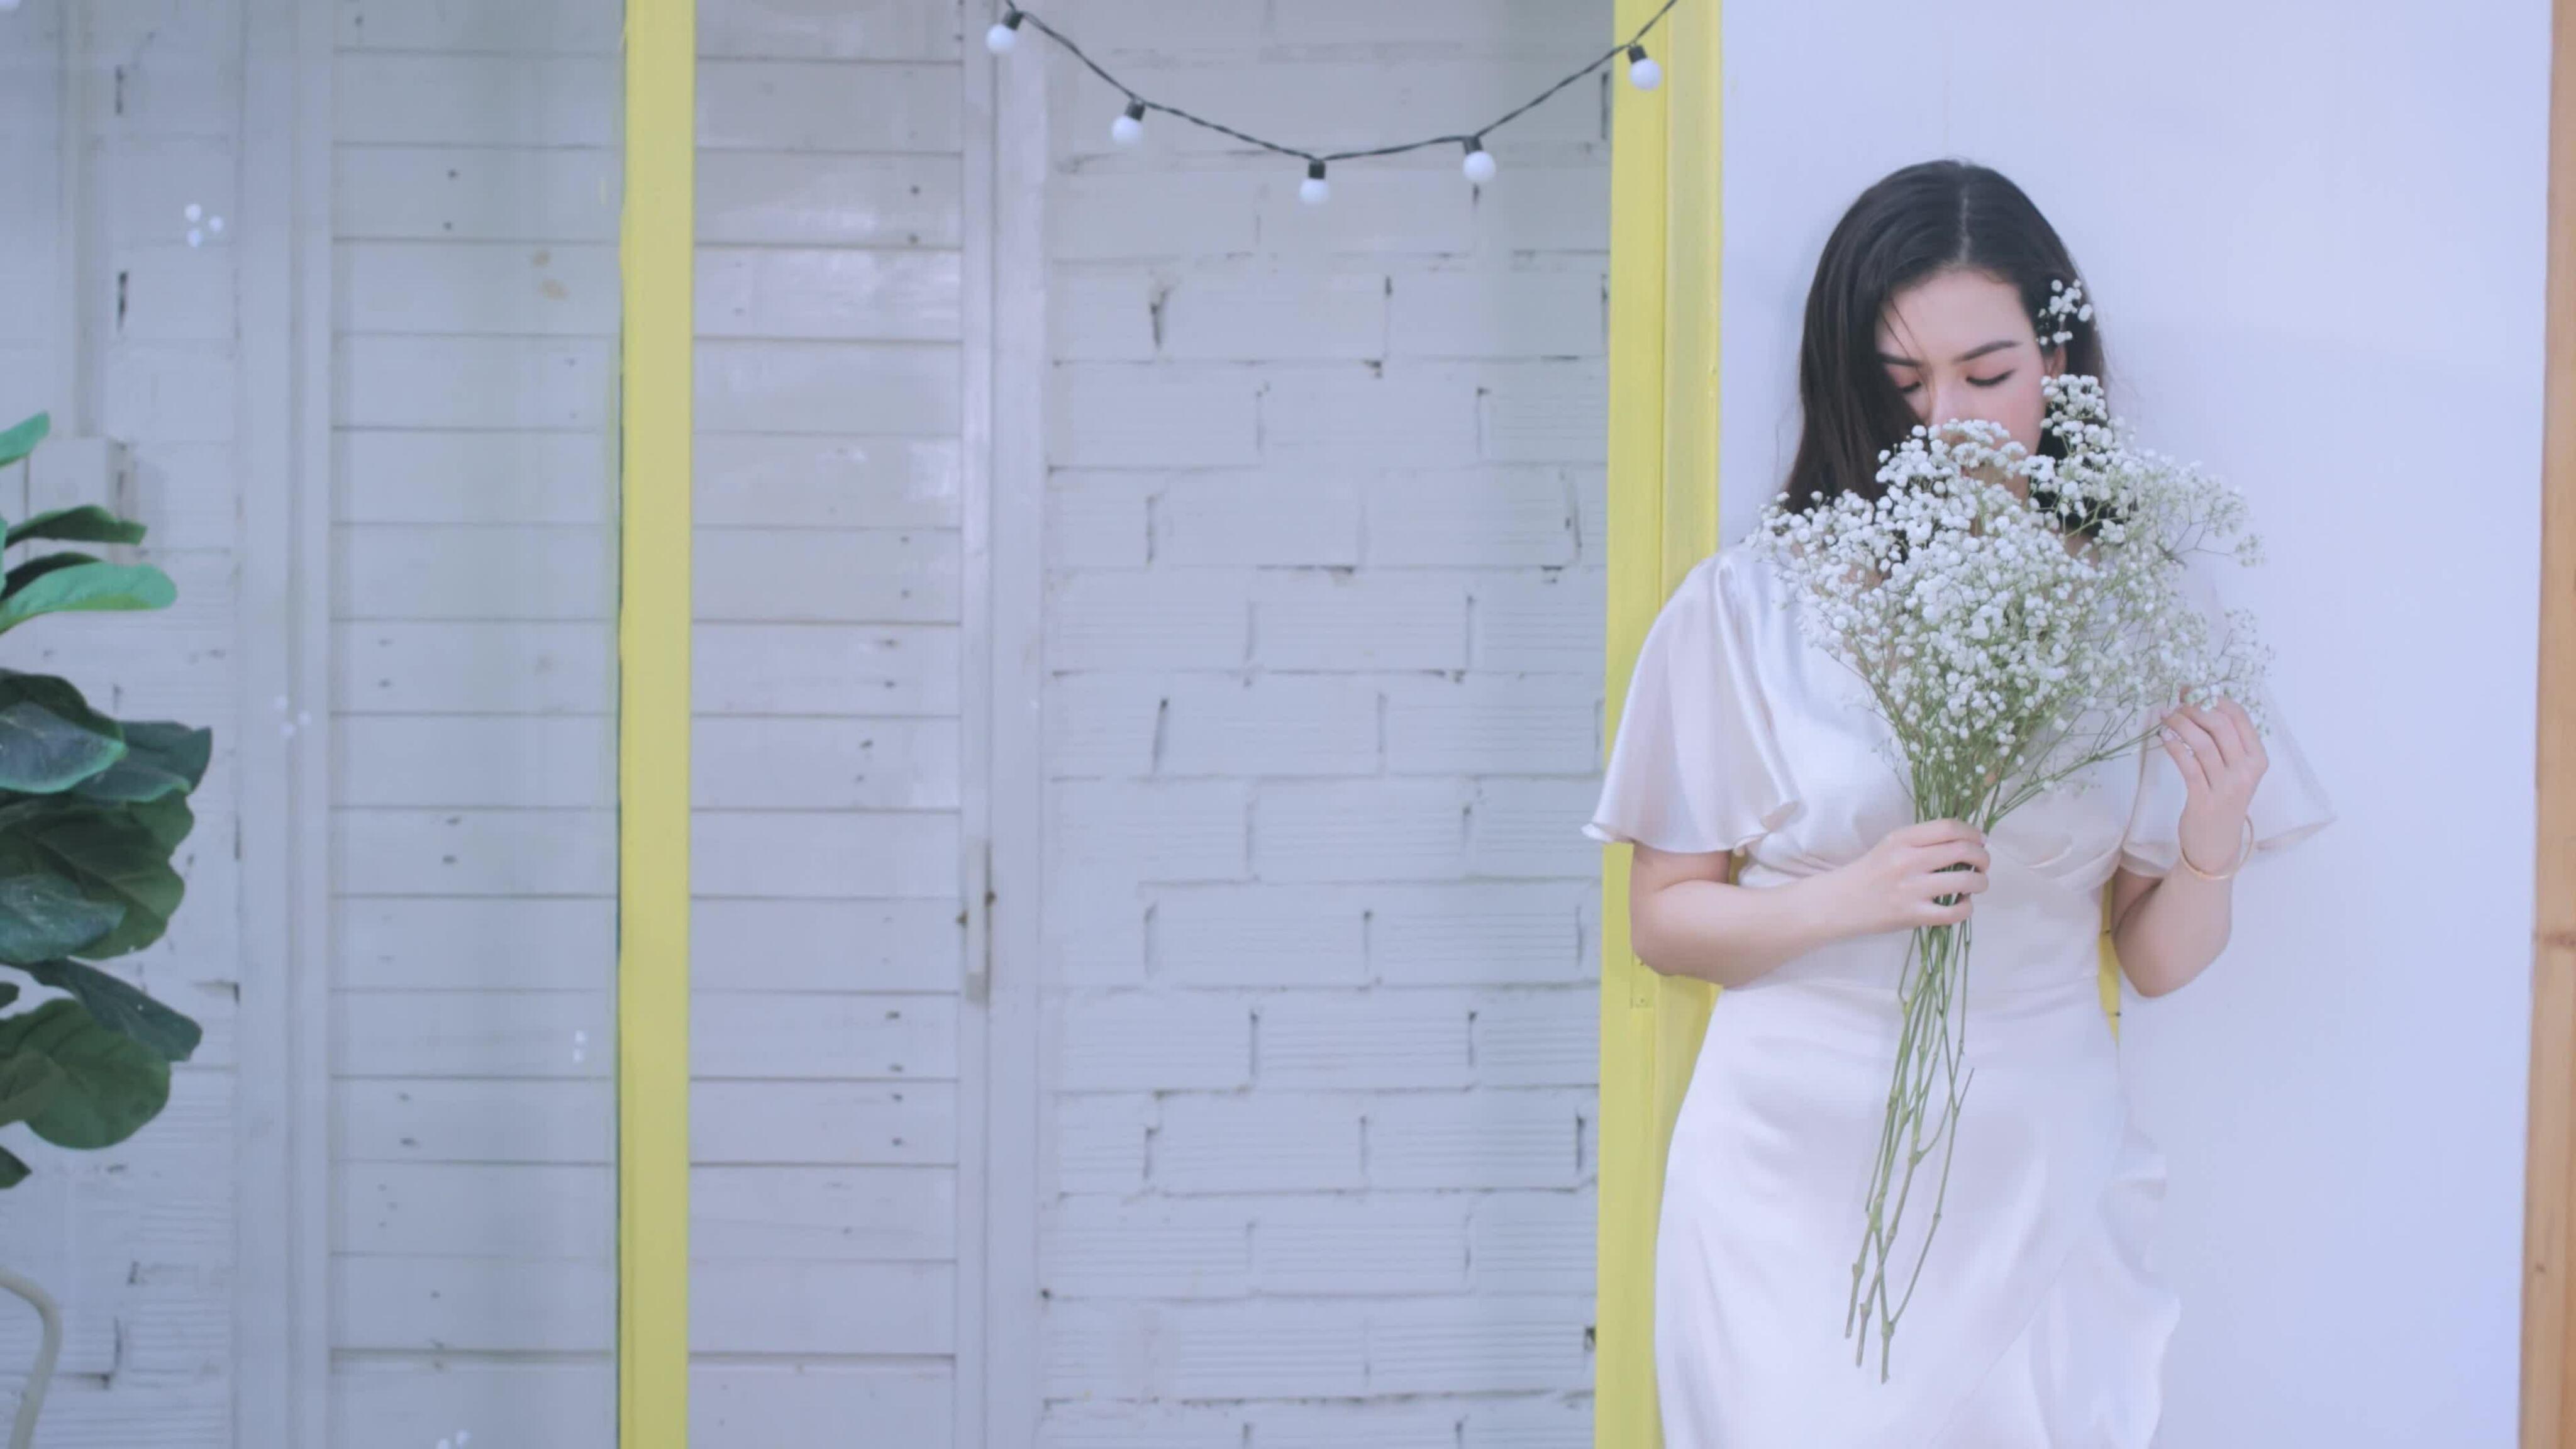 Hoa hậu Diễm Trần làm mẫu ảnh